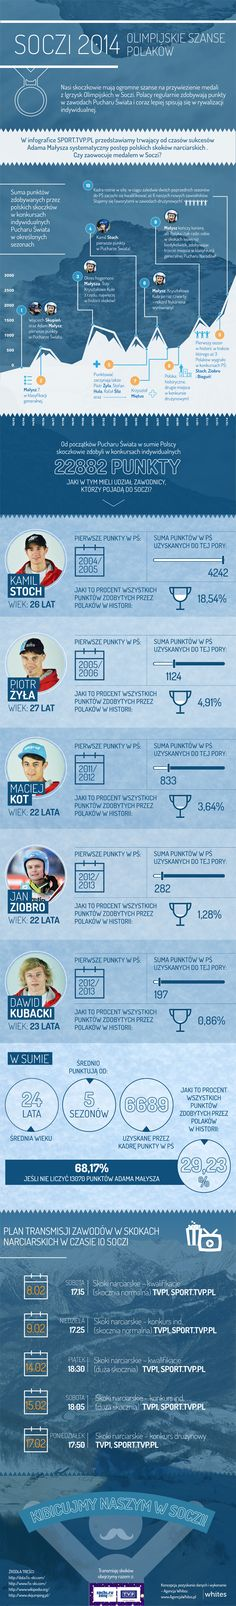 Soczi winter olympics